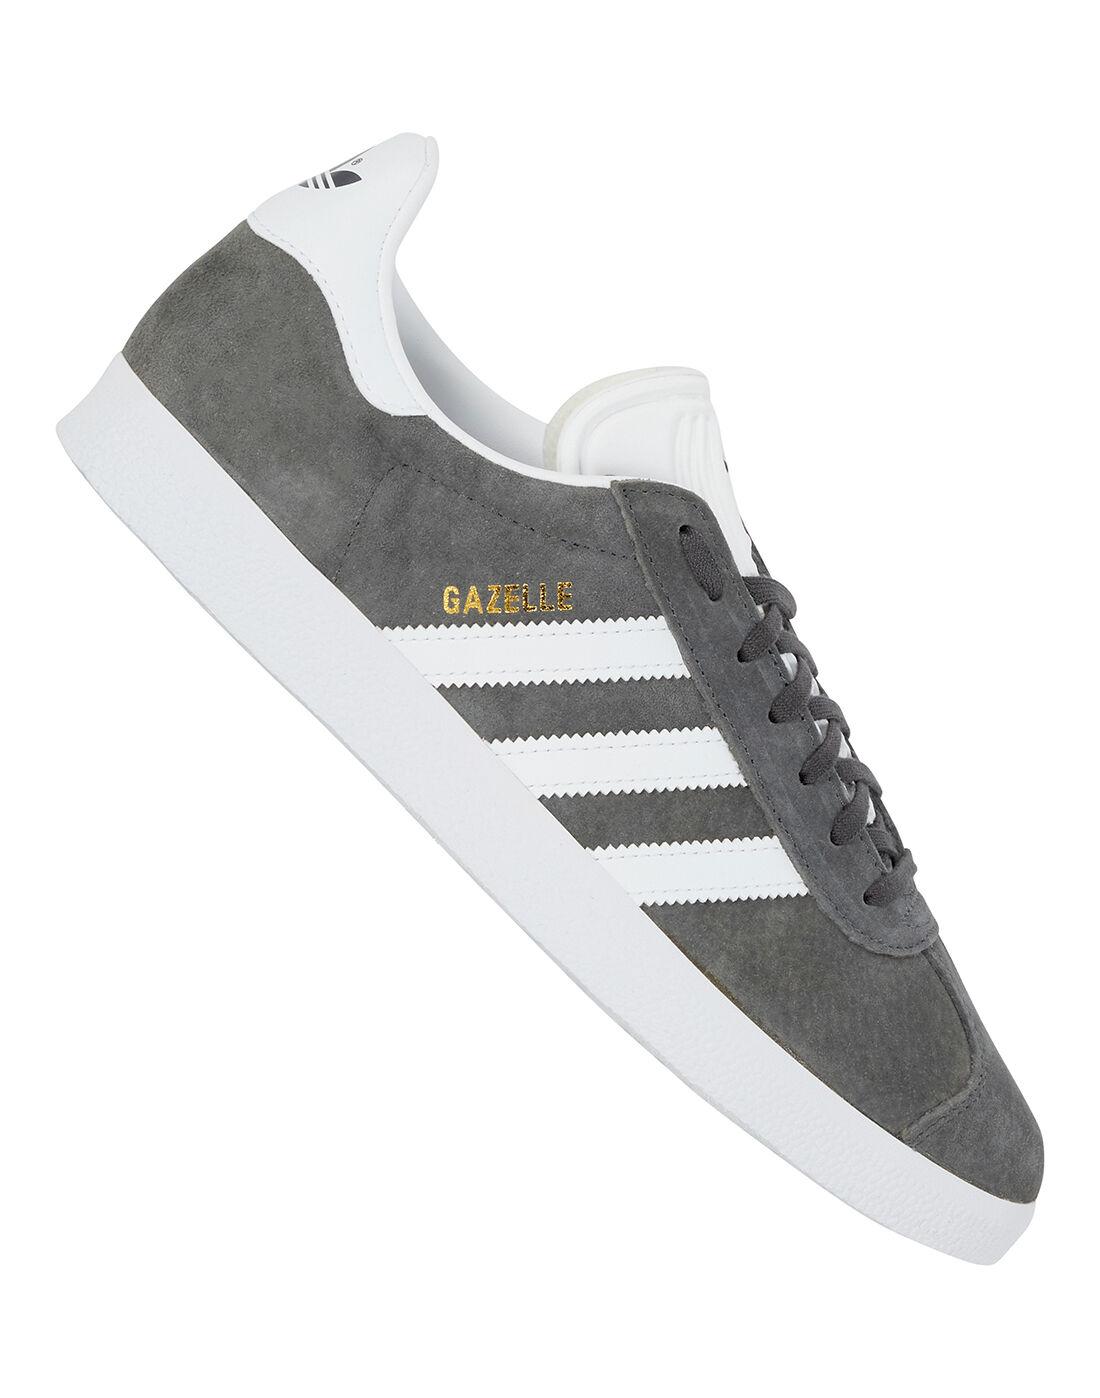 adidas Originals nike sneakers orange buddha boots | Mens Gazelle